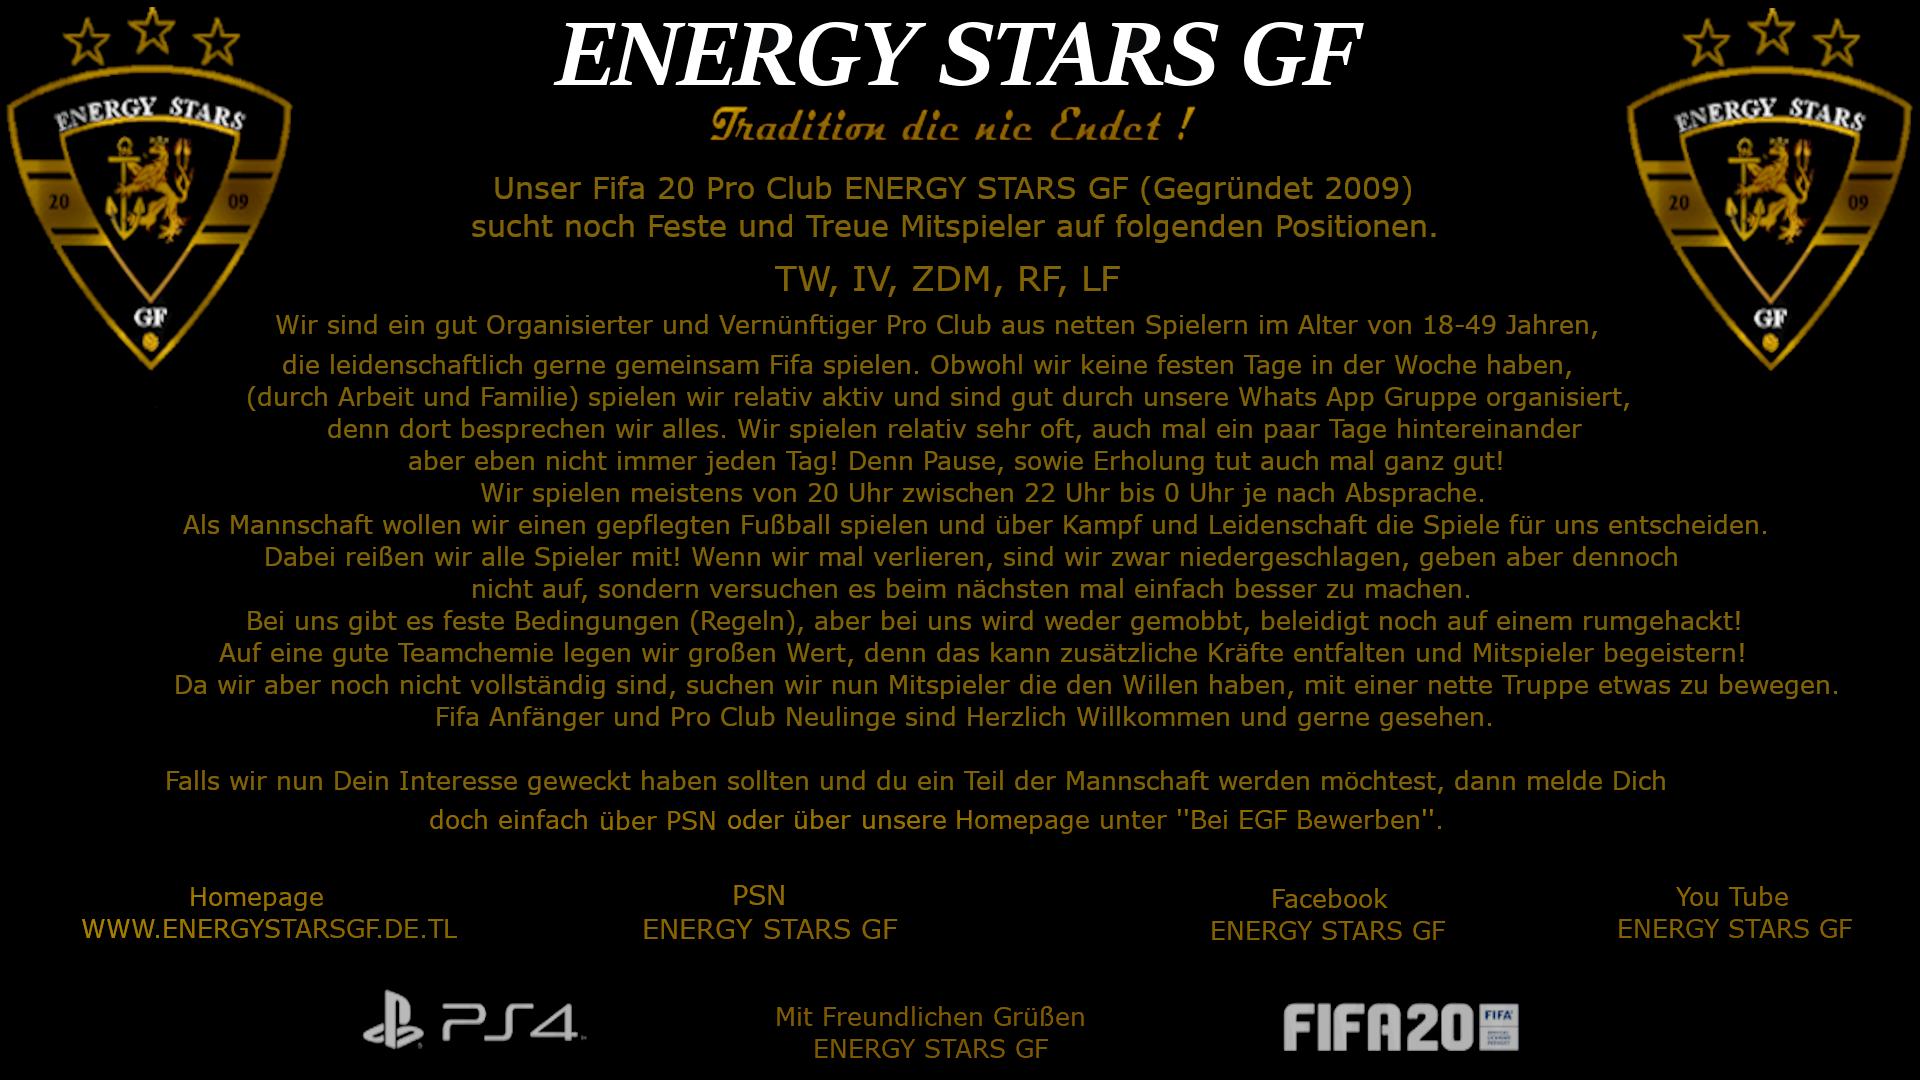 ENERGY%20STARS%20GF%20SPIELERSUCHE%20FIFA%2020%2011.11.19.png